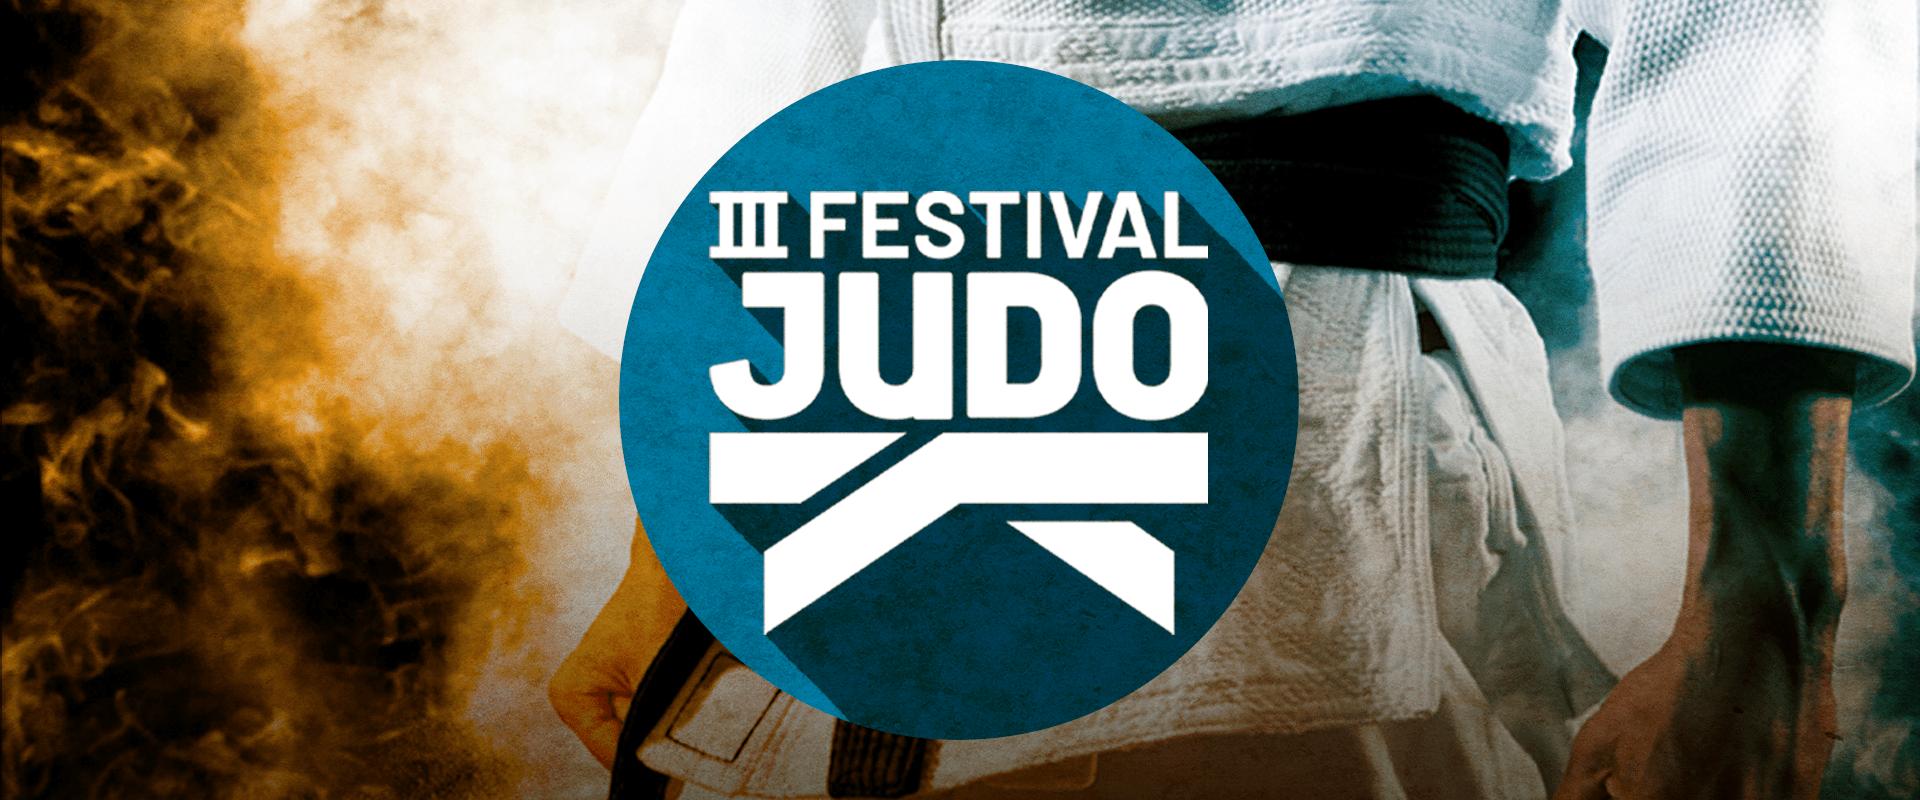 site_festival judo_banner